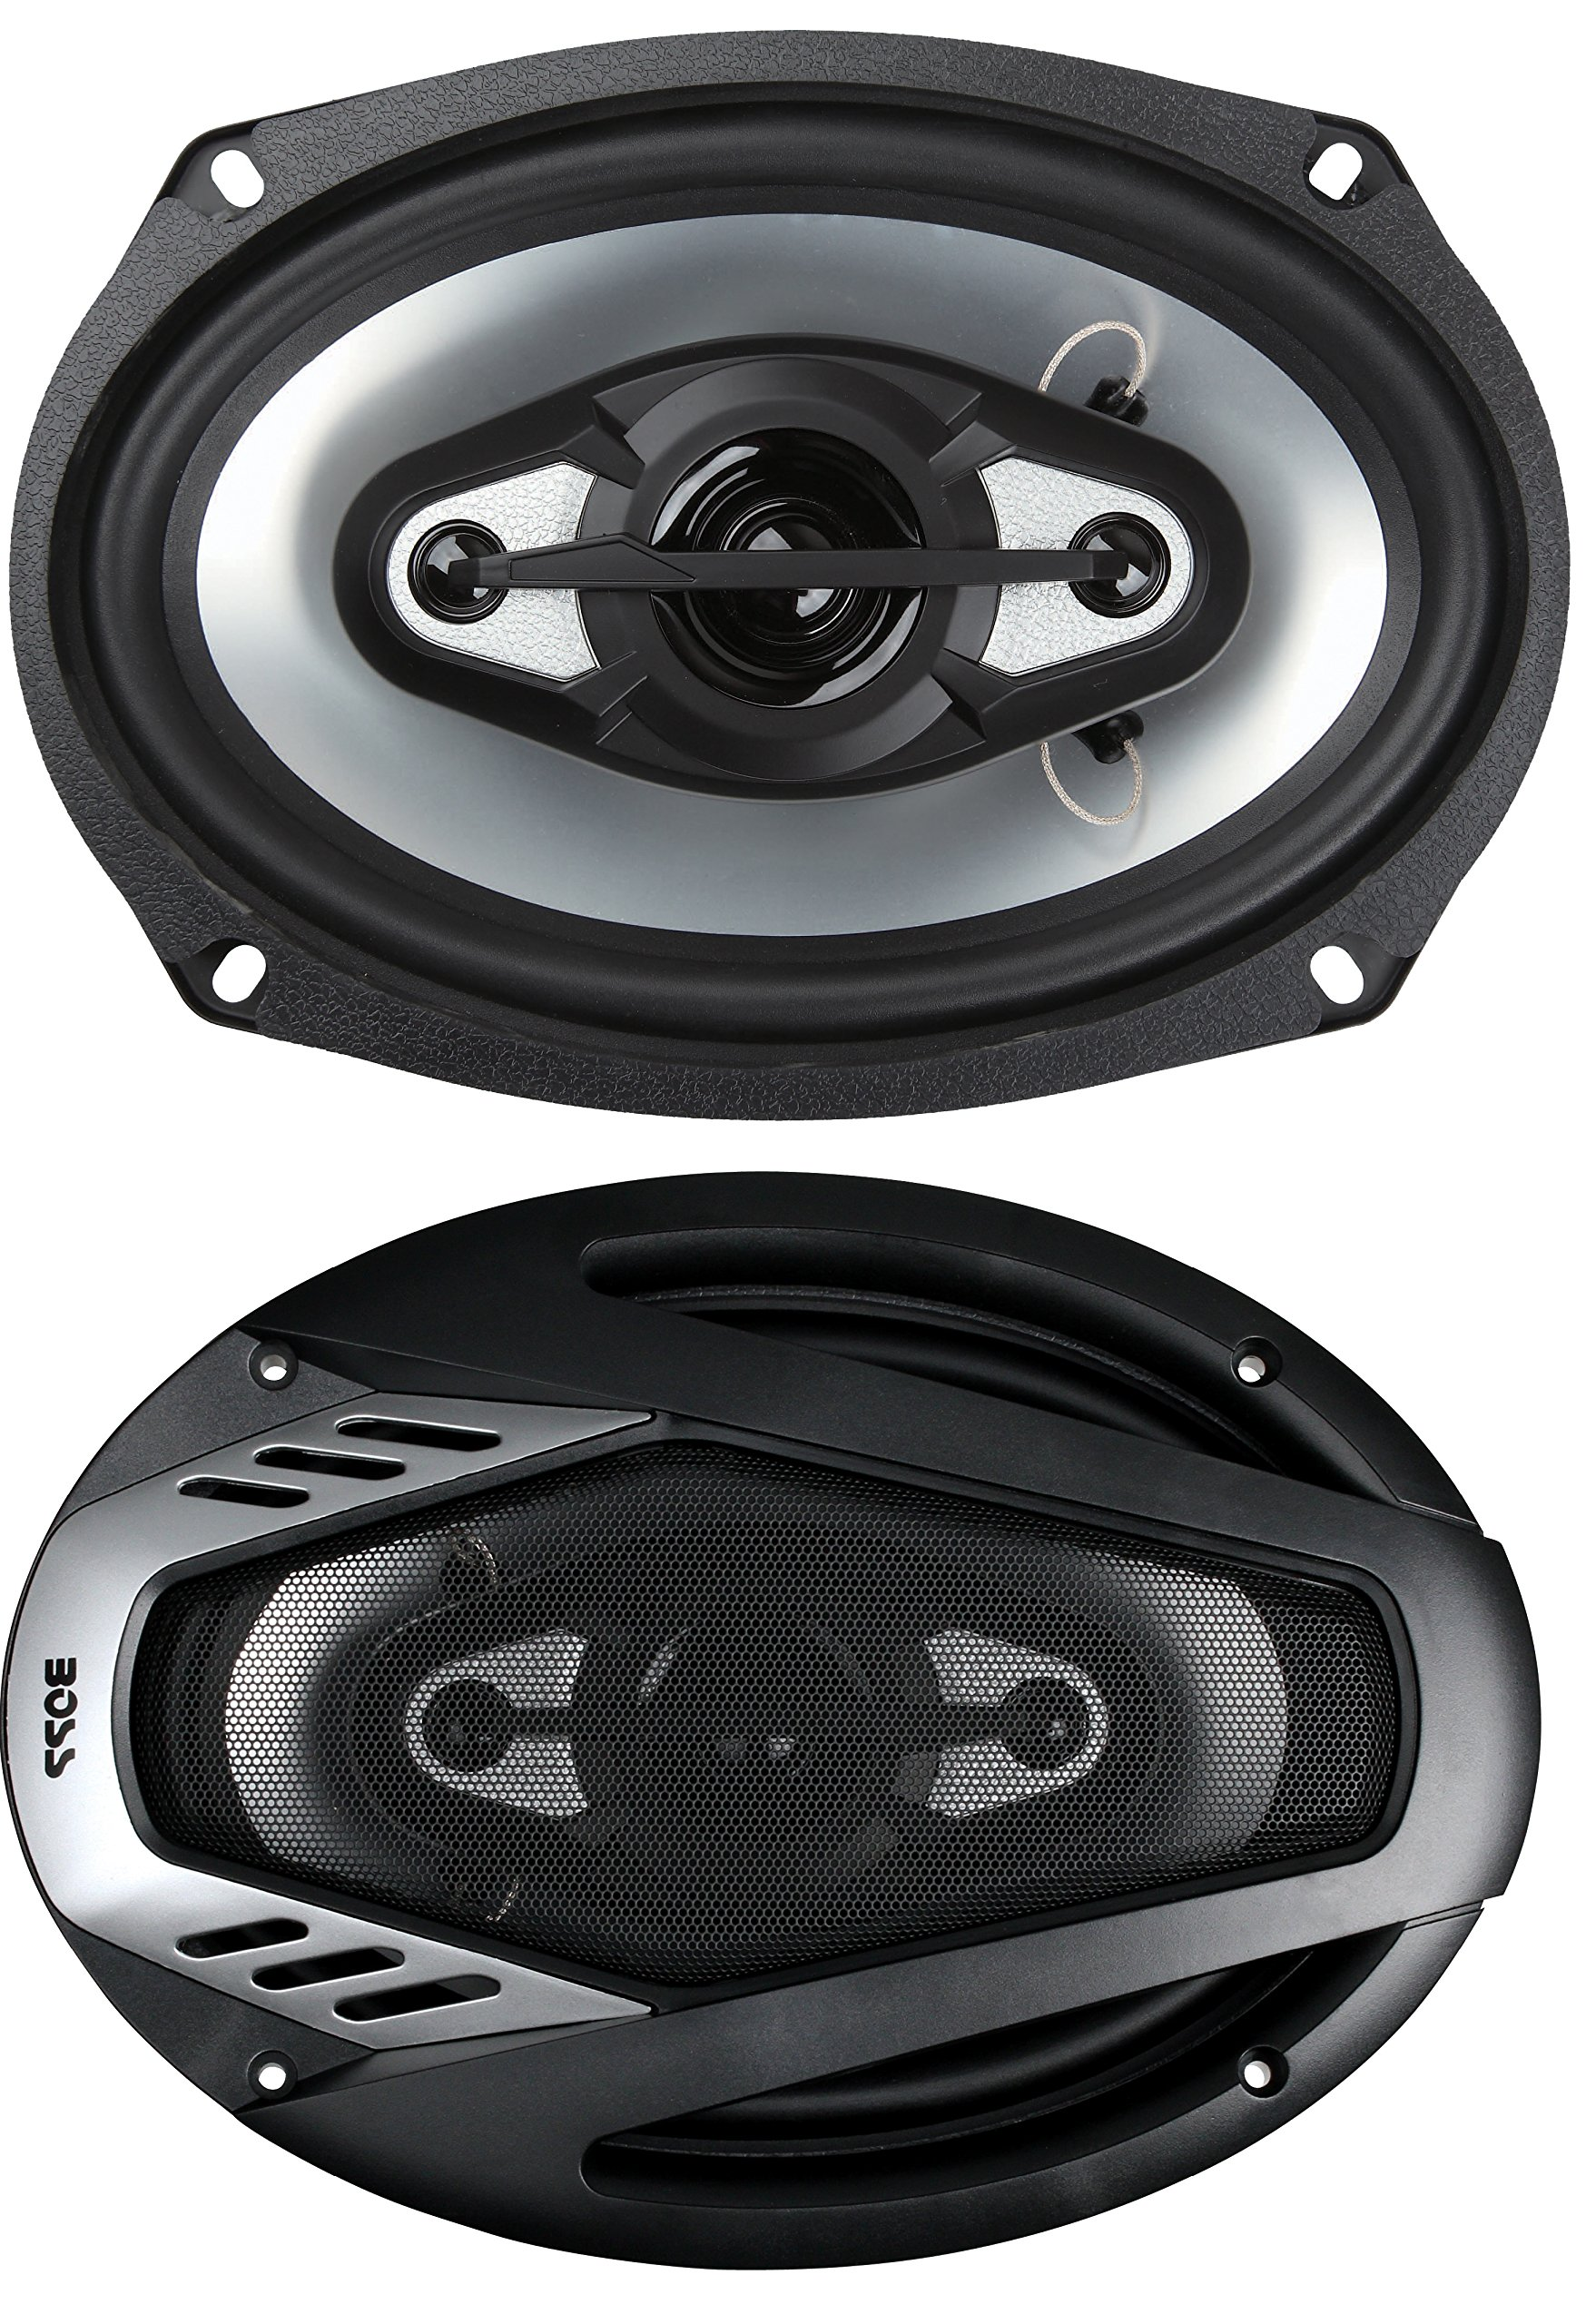 BOSS Audio NX694 800 Watt (Per Pair), 6 x 9 Inch, Full Range, 4 Way Car Speakers (Sold in Pairs)